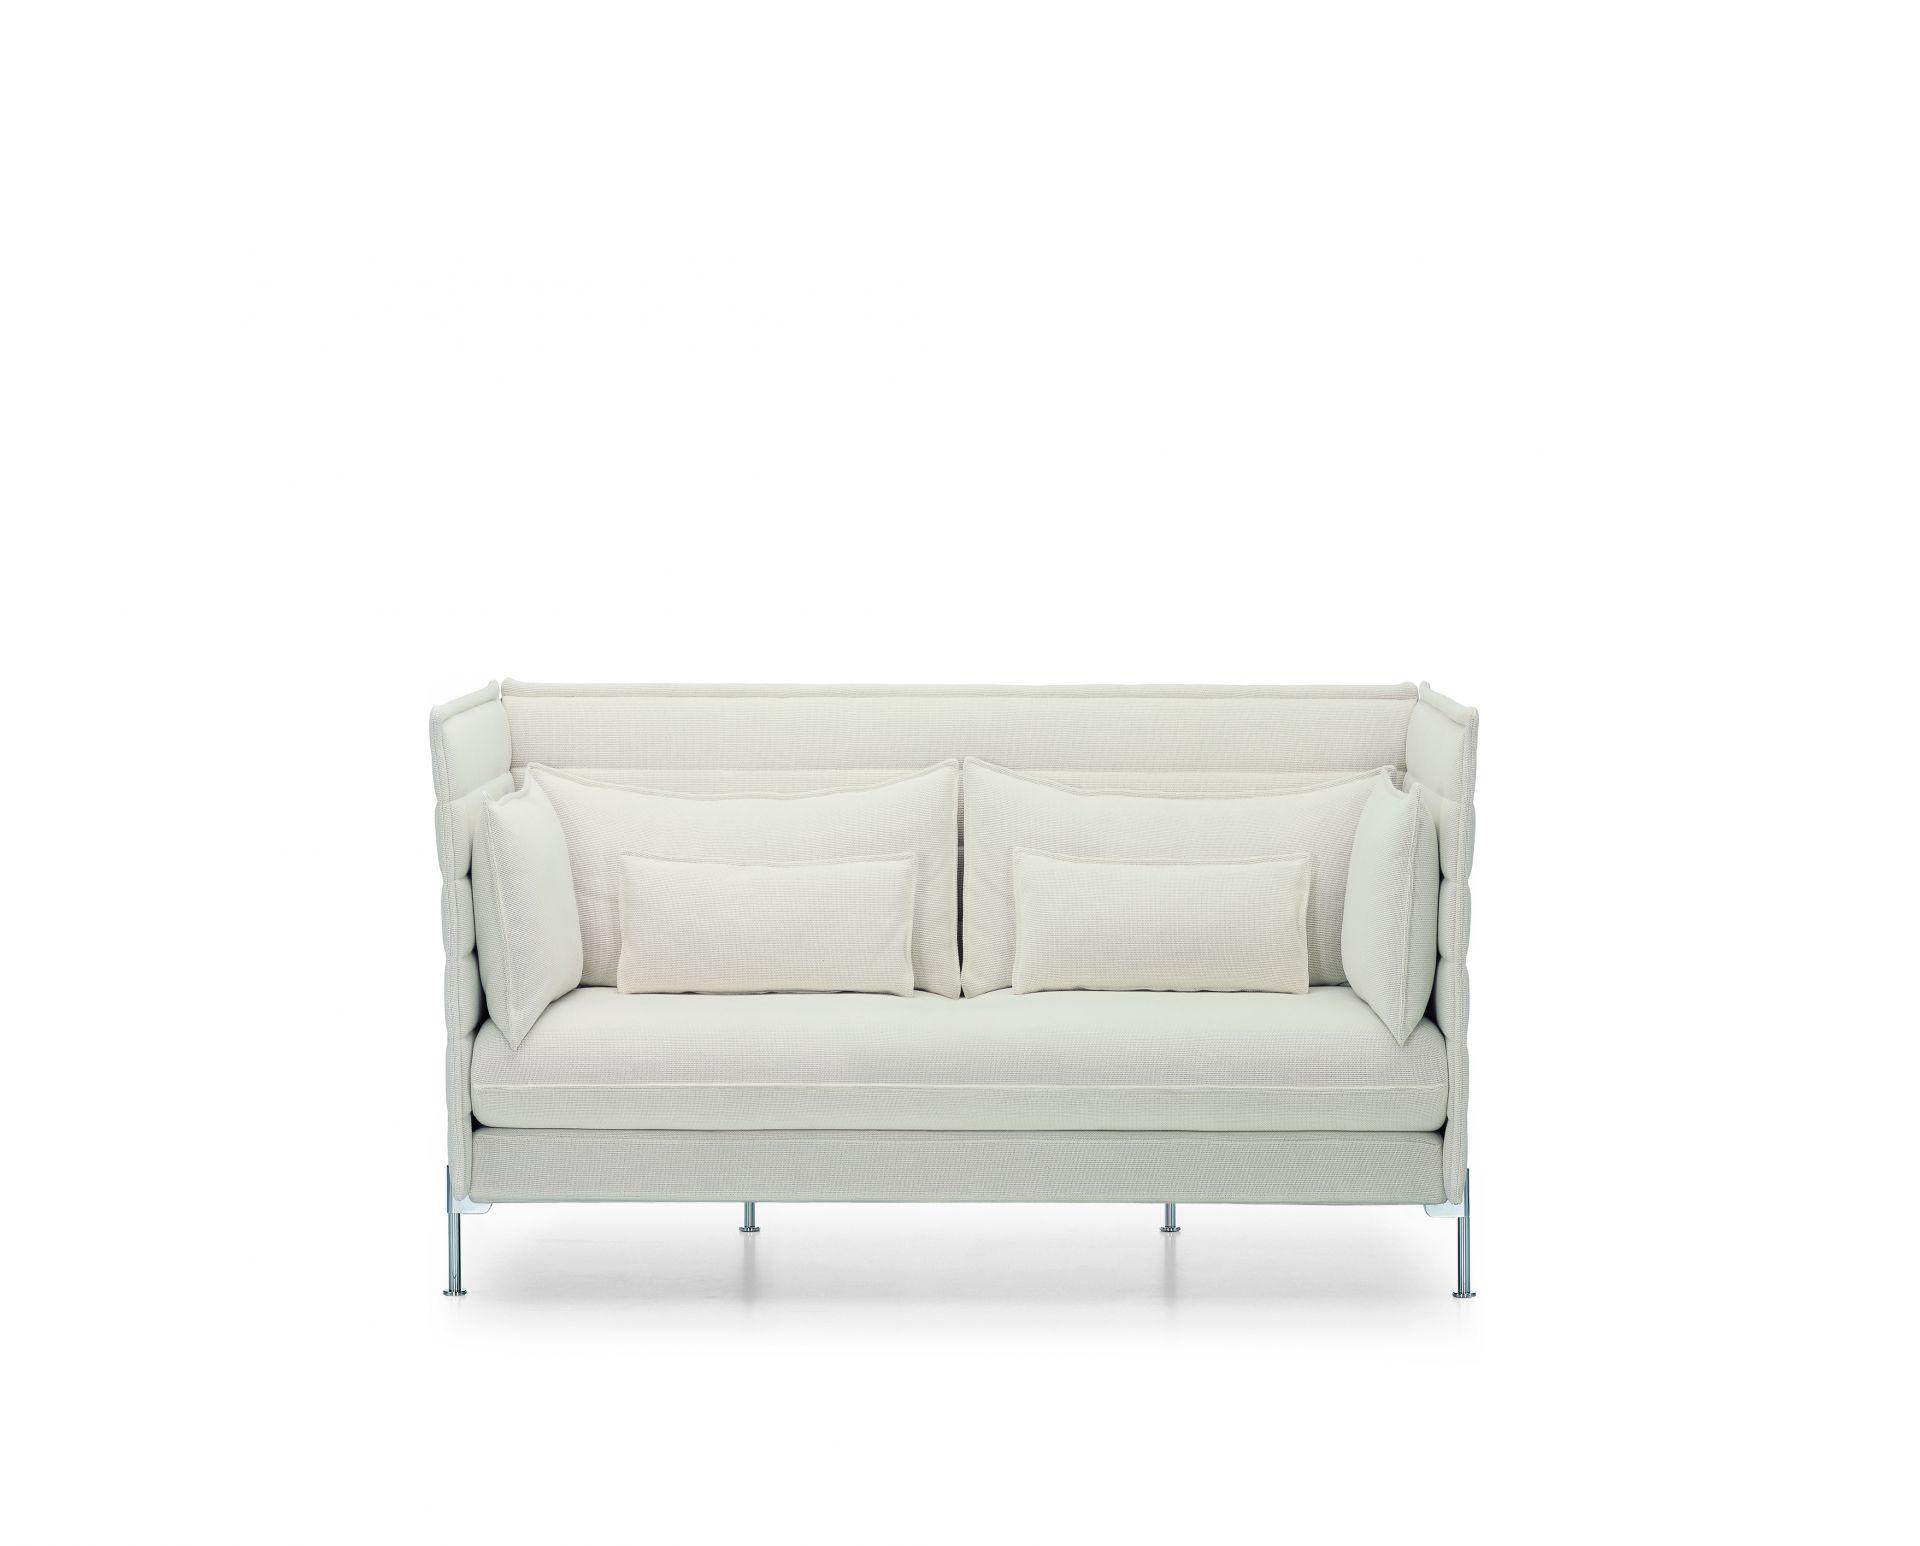 Alcove two-seater Sofa Vitra